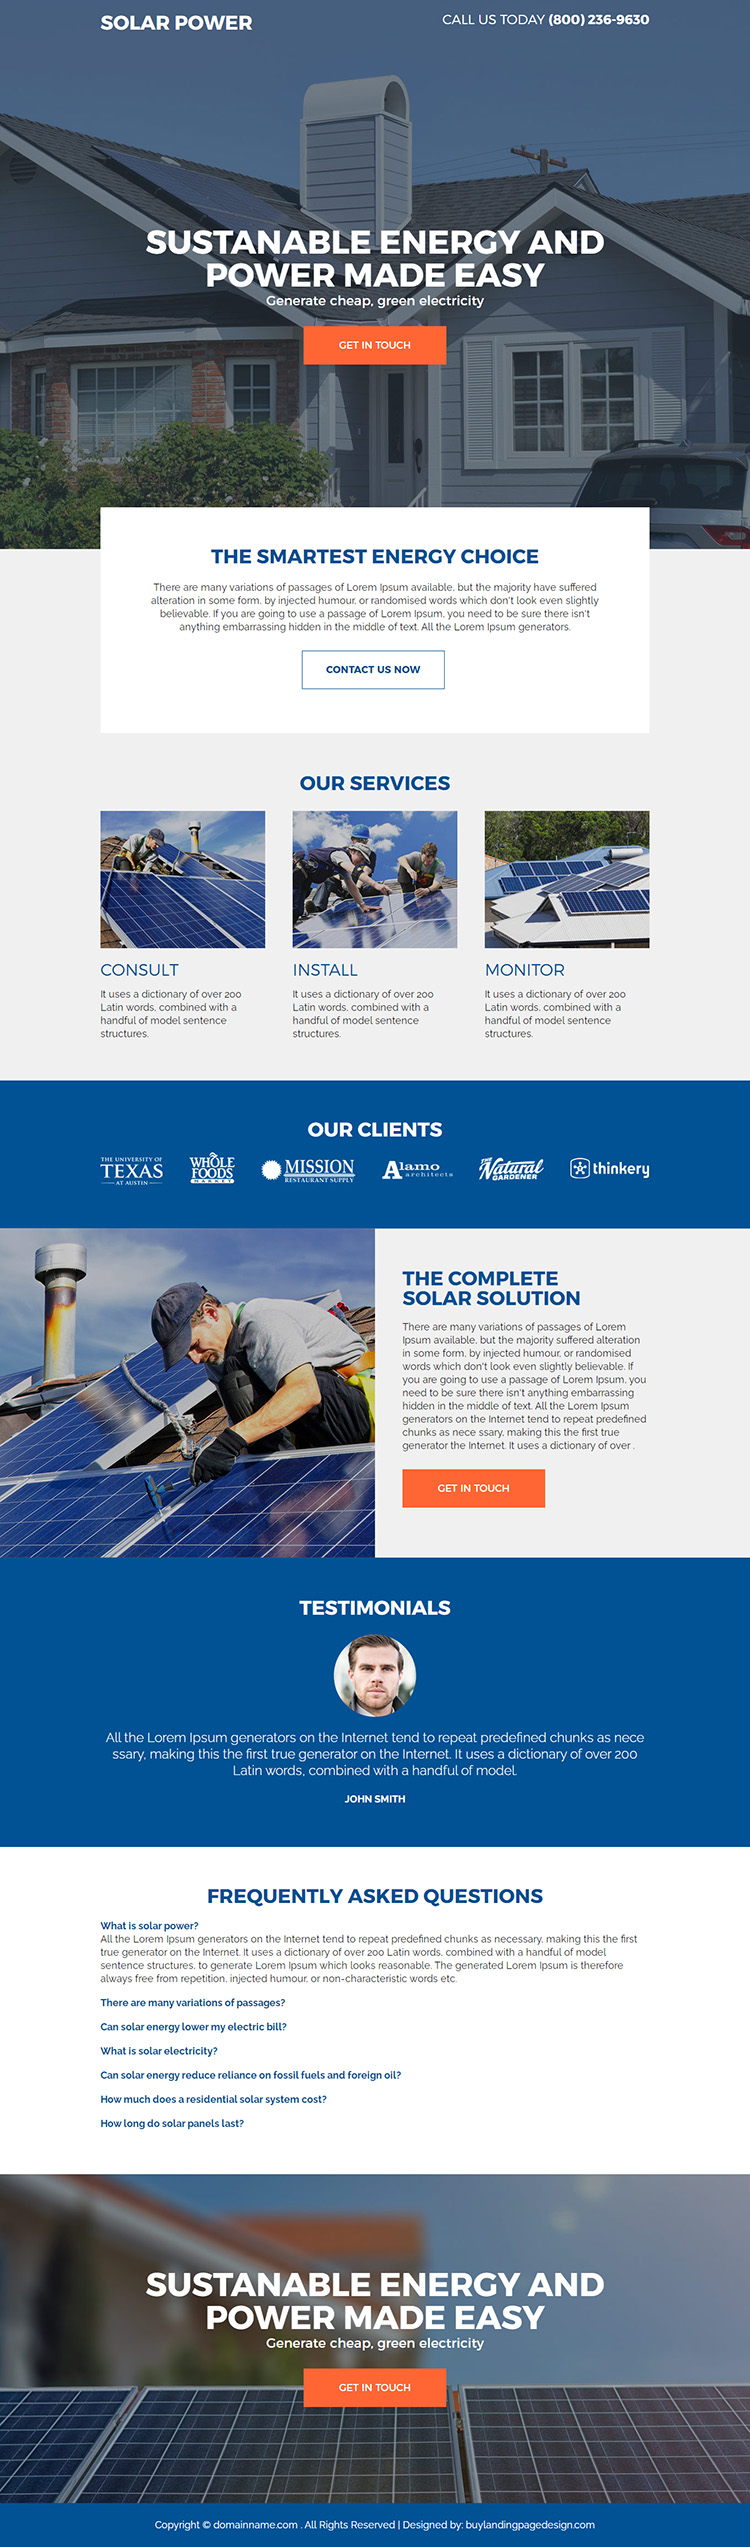 residential solar energy companies responsive landing page design